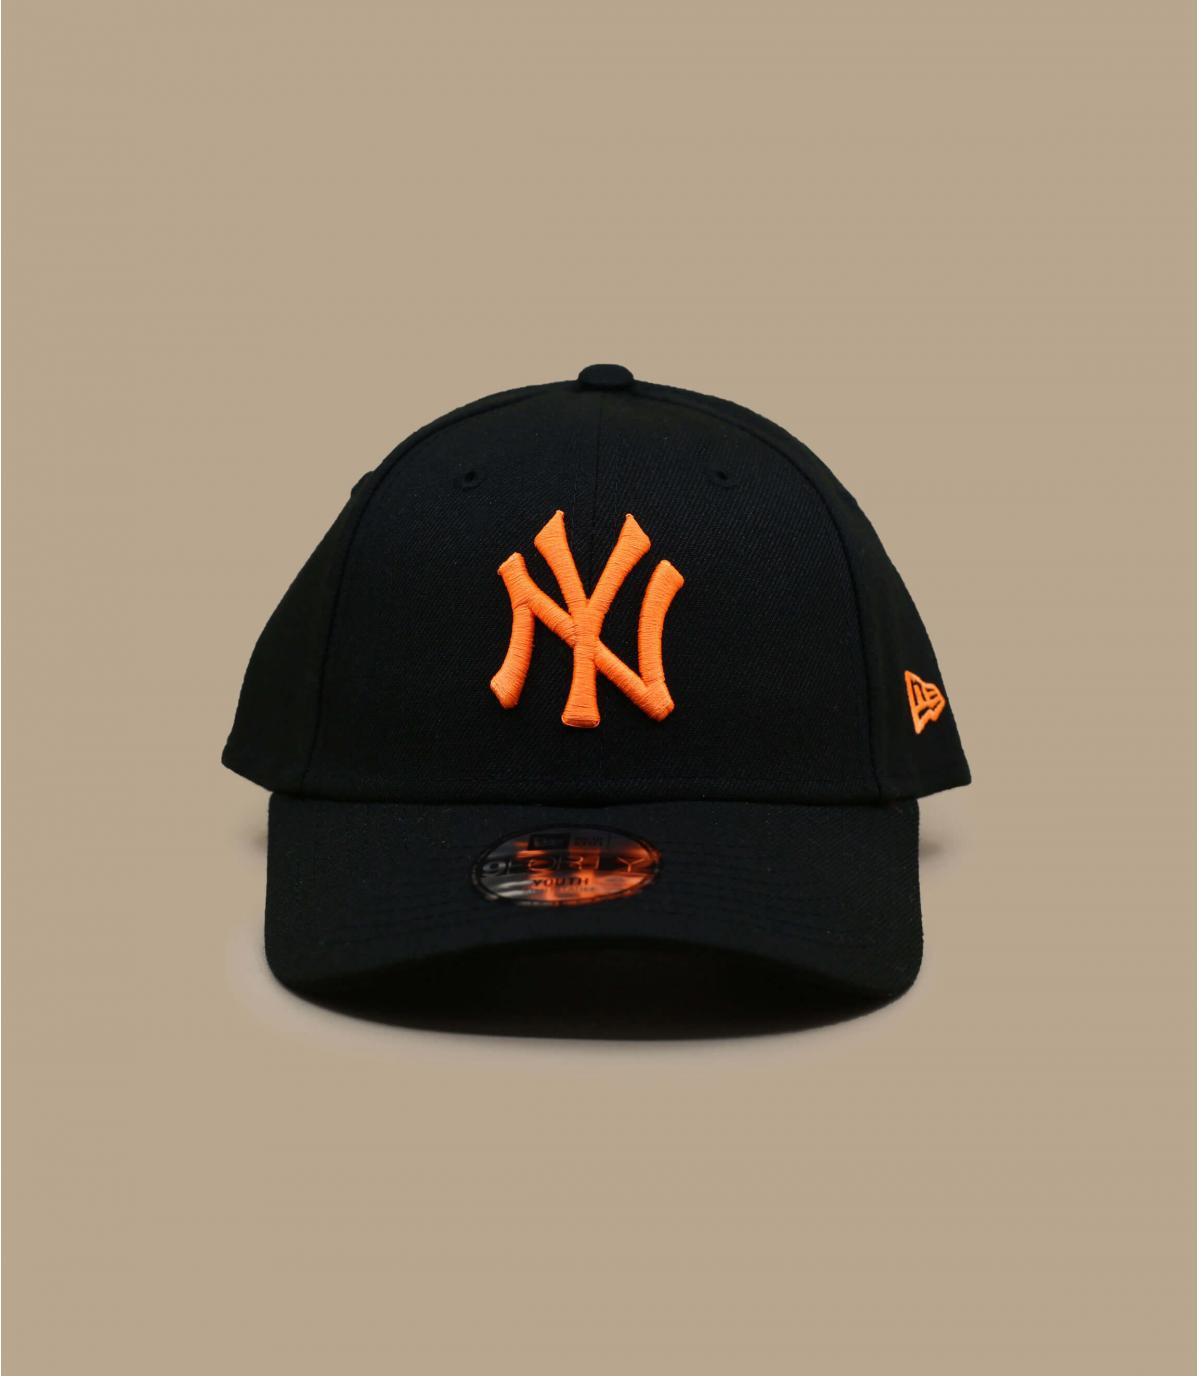 Kinder Cap NY schwarz orange